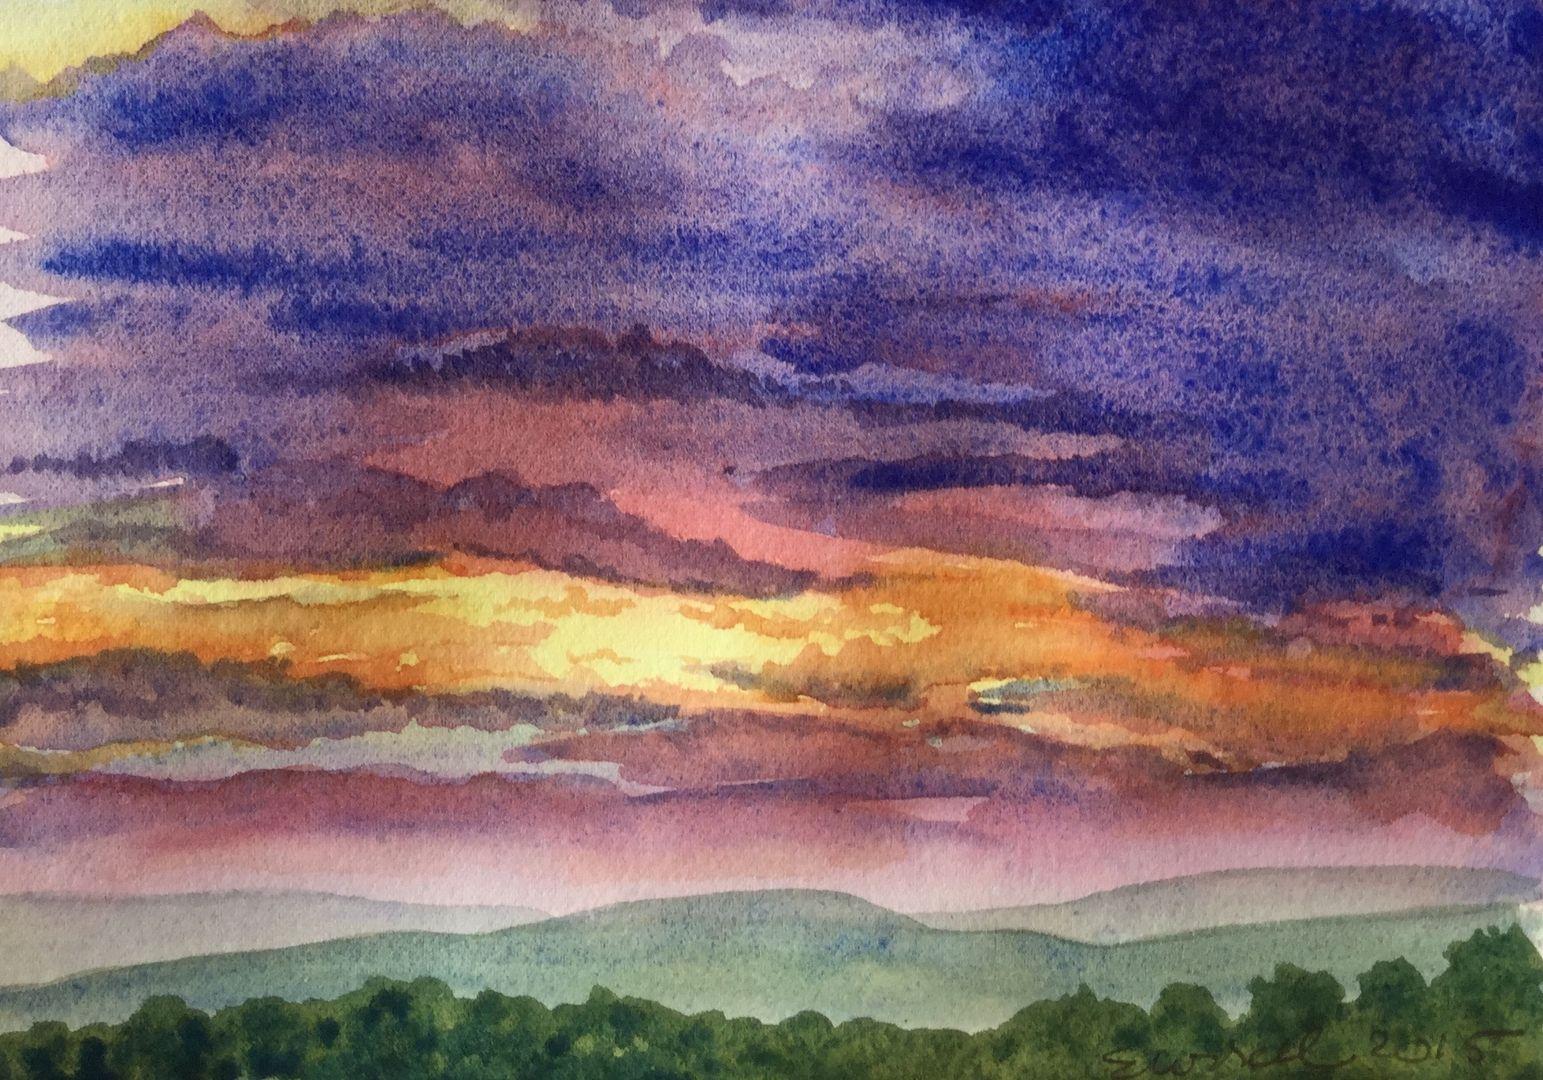 Original watercolor art for sale - Eworrell Art Original Watercolor Paintings Watercolor Paintings For Sale Watercolor Paintings Of Flowers